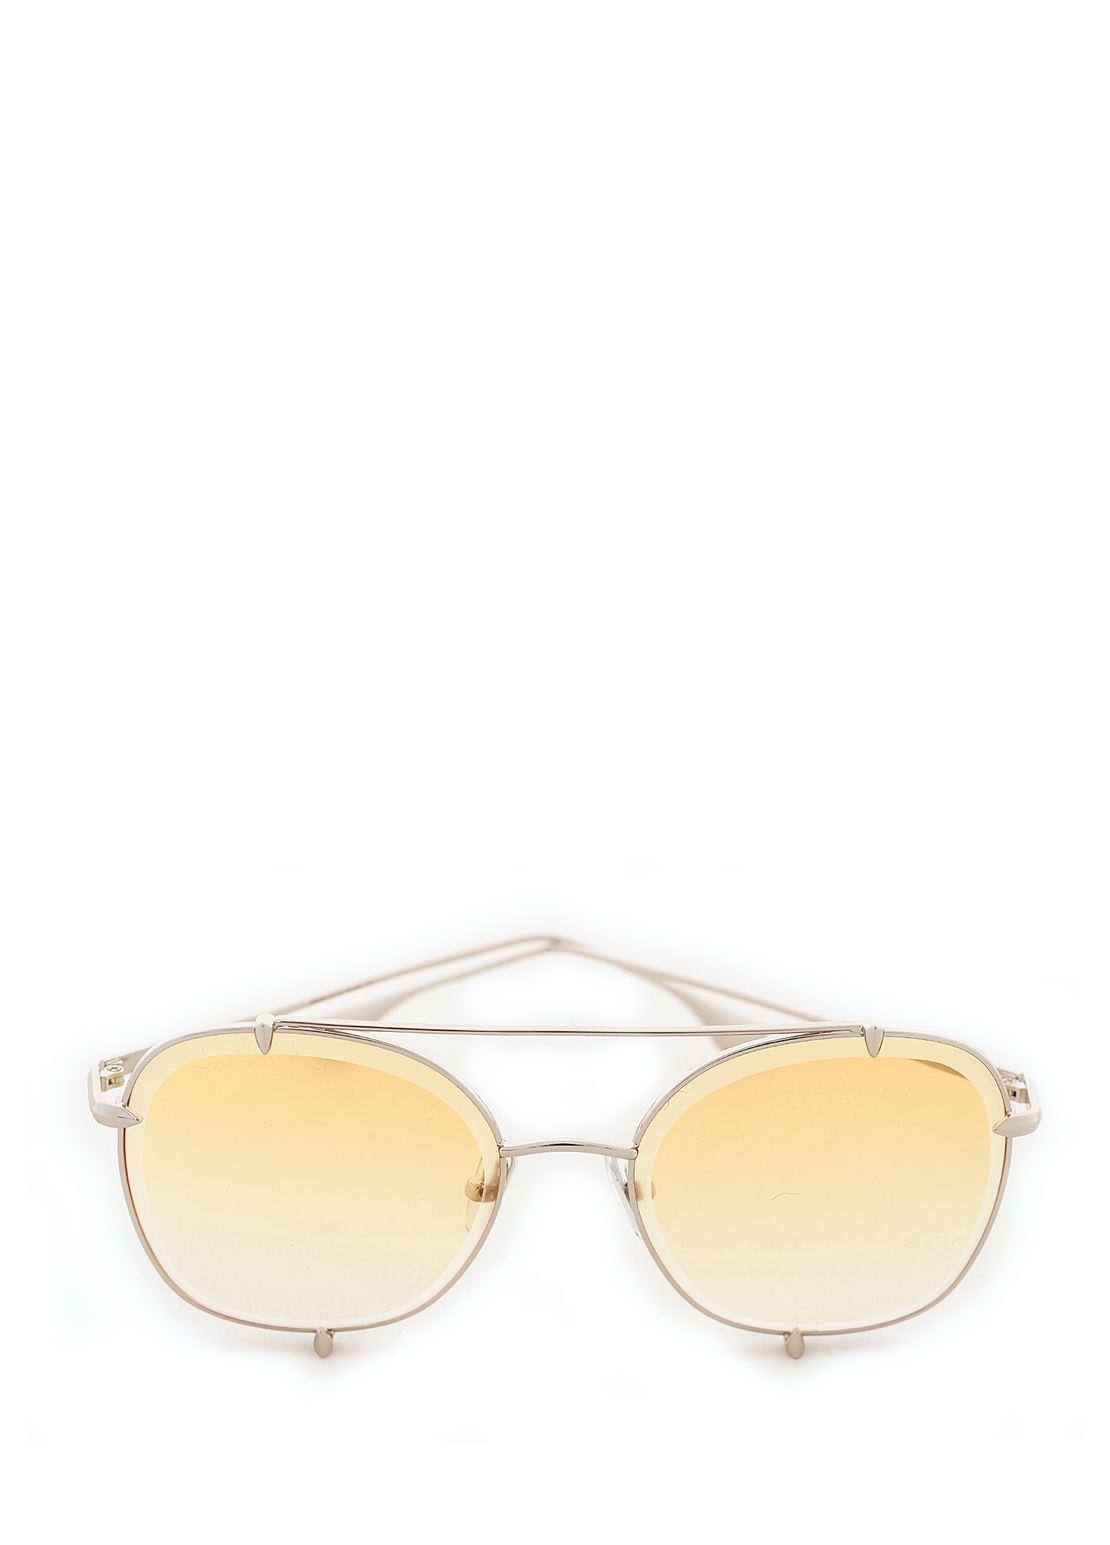 e307b3eabc Γυναικεία Γυαλιά Ηλίου Ultra Vision